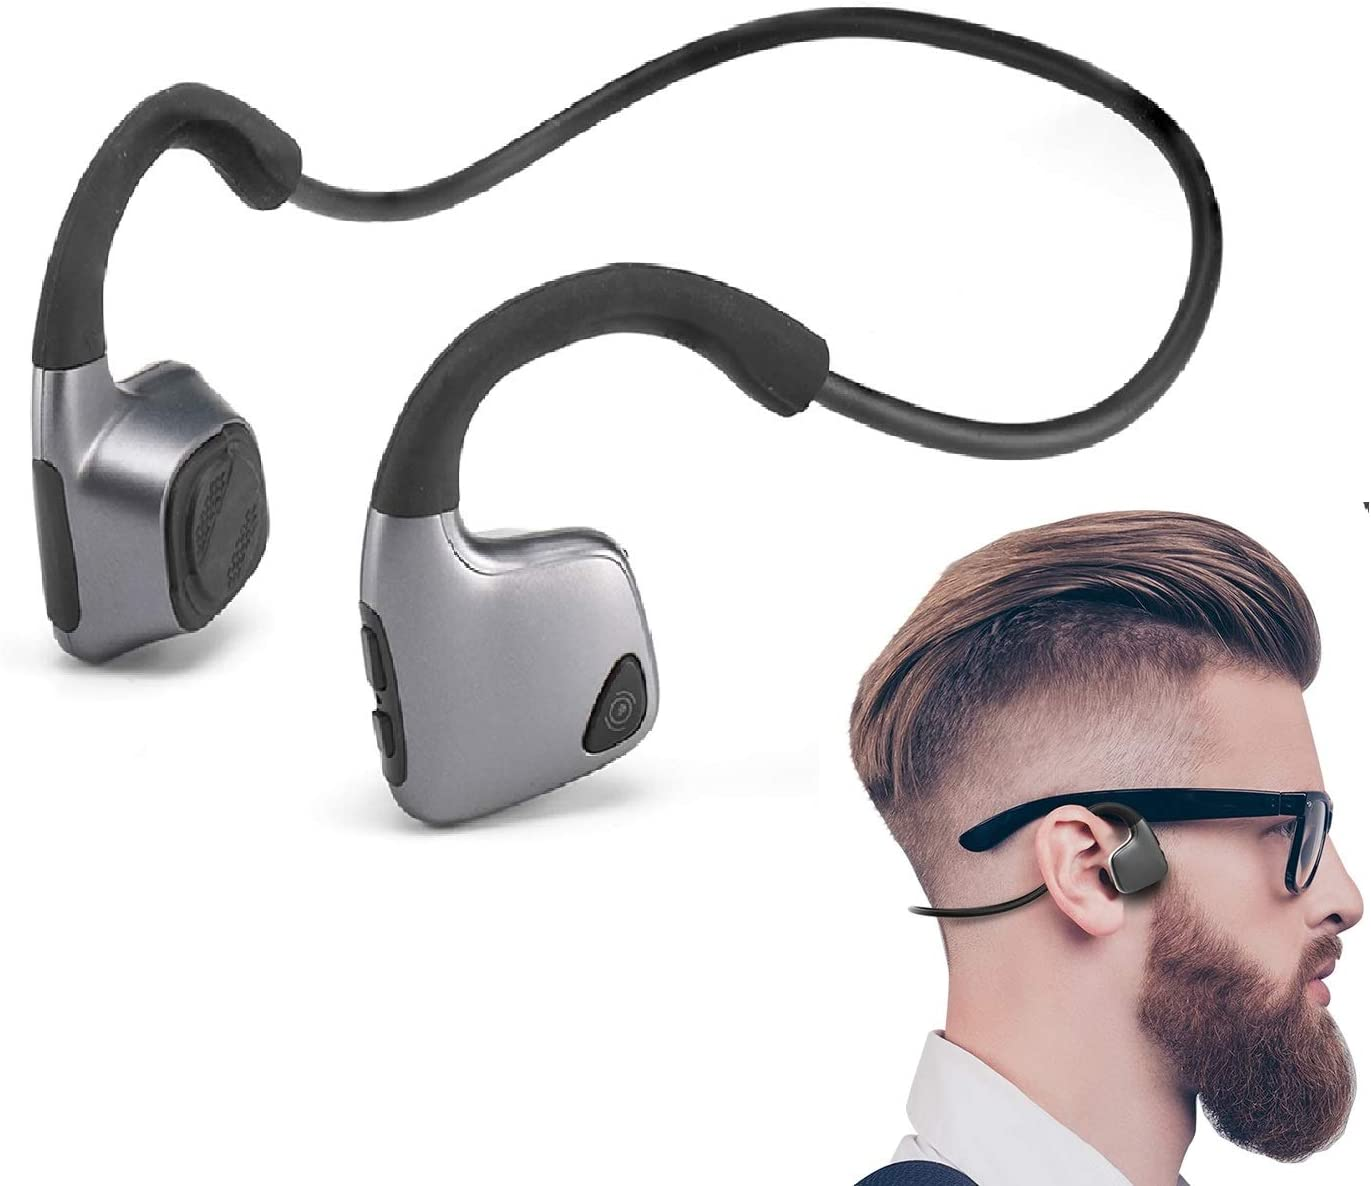 Auriculares Conduccion Osea Bluetooth Deportivoshttps://amzn.to/2IsTmCN